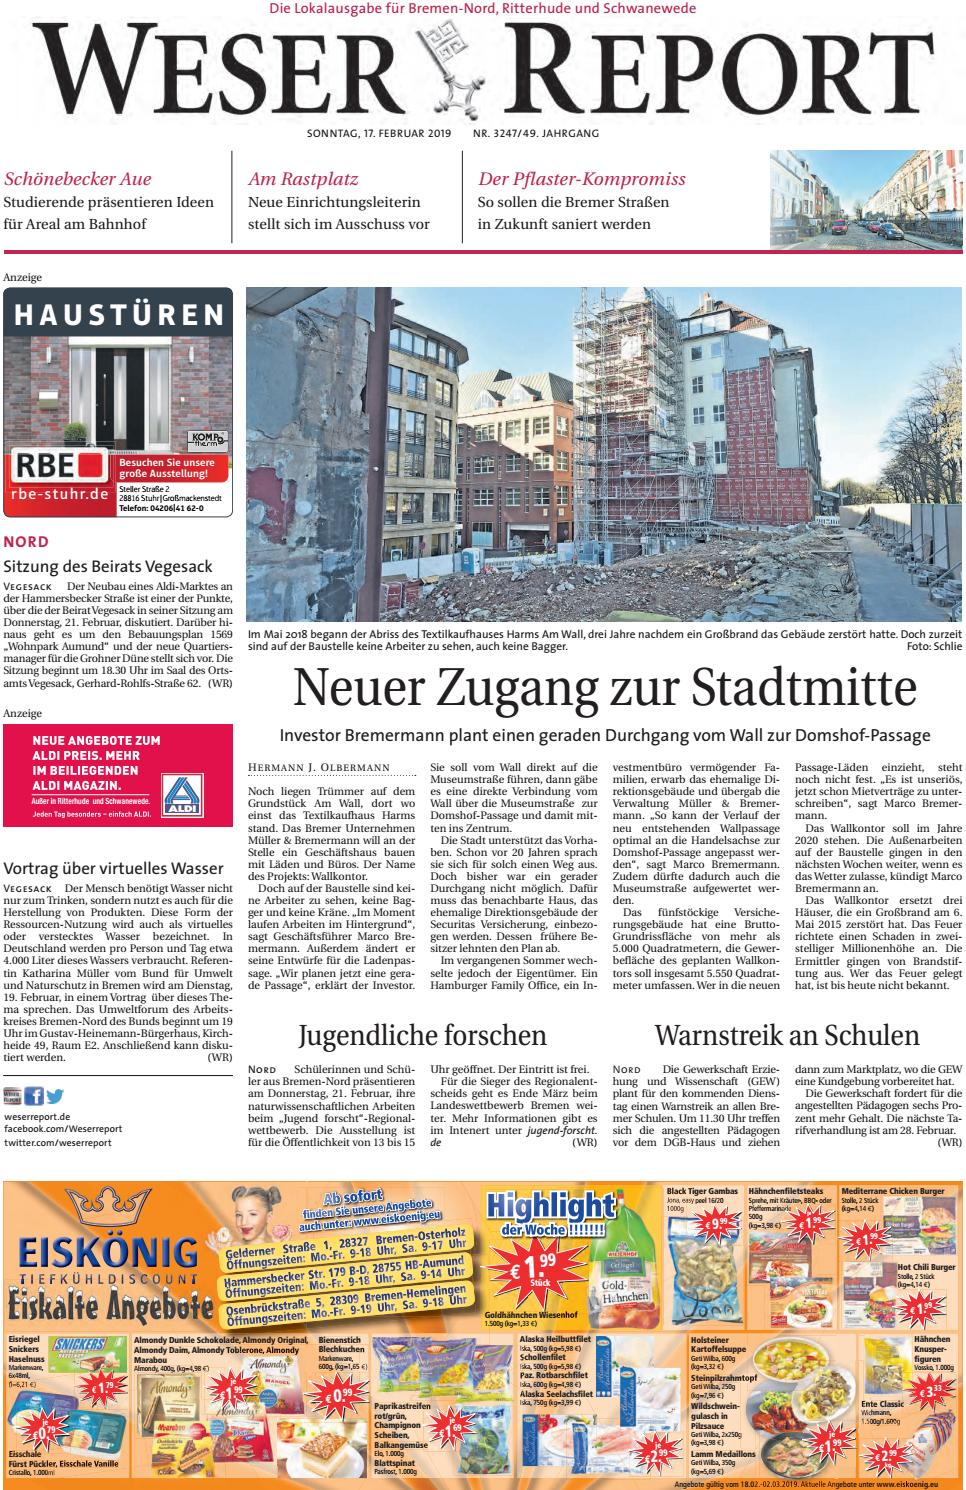 Weser Report - Nord vom 17.02.2019 by KPS Verlagsgesellschaft mbH ...